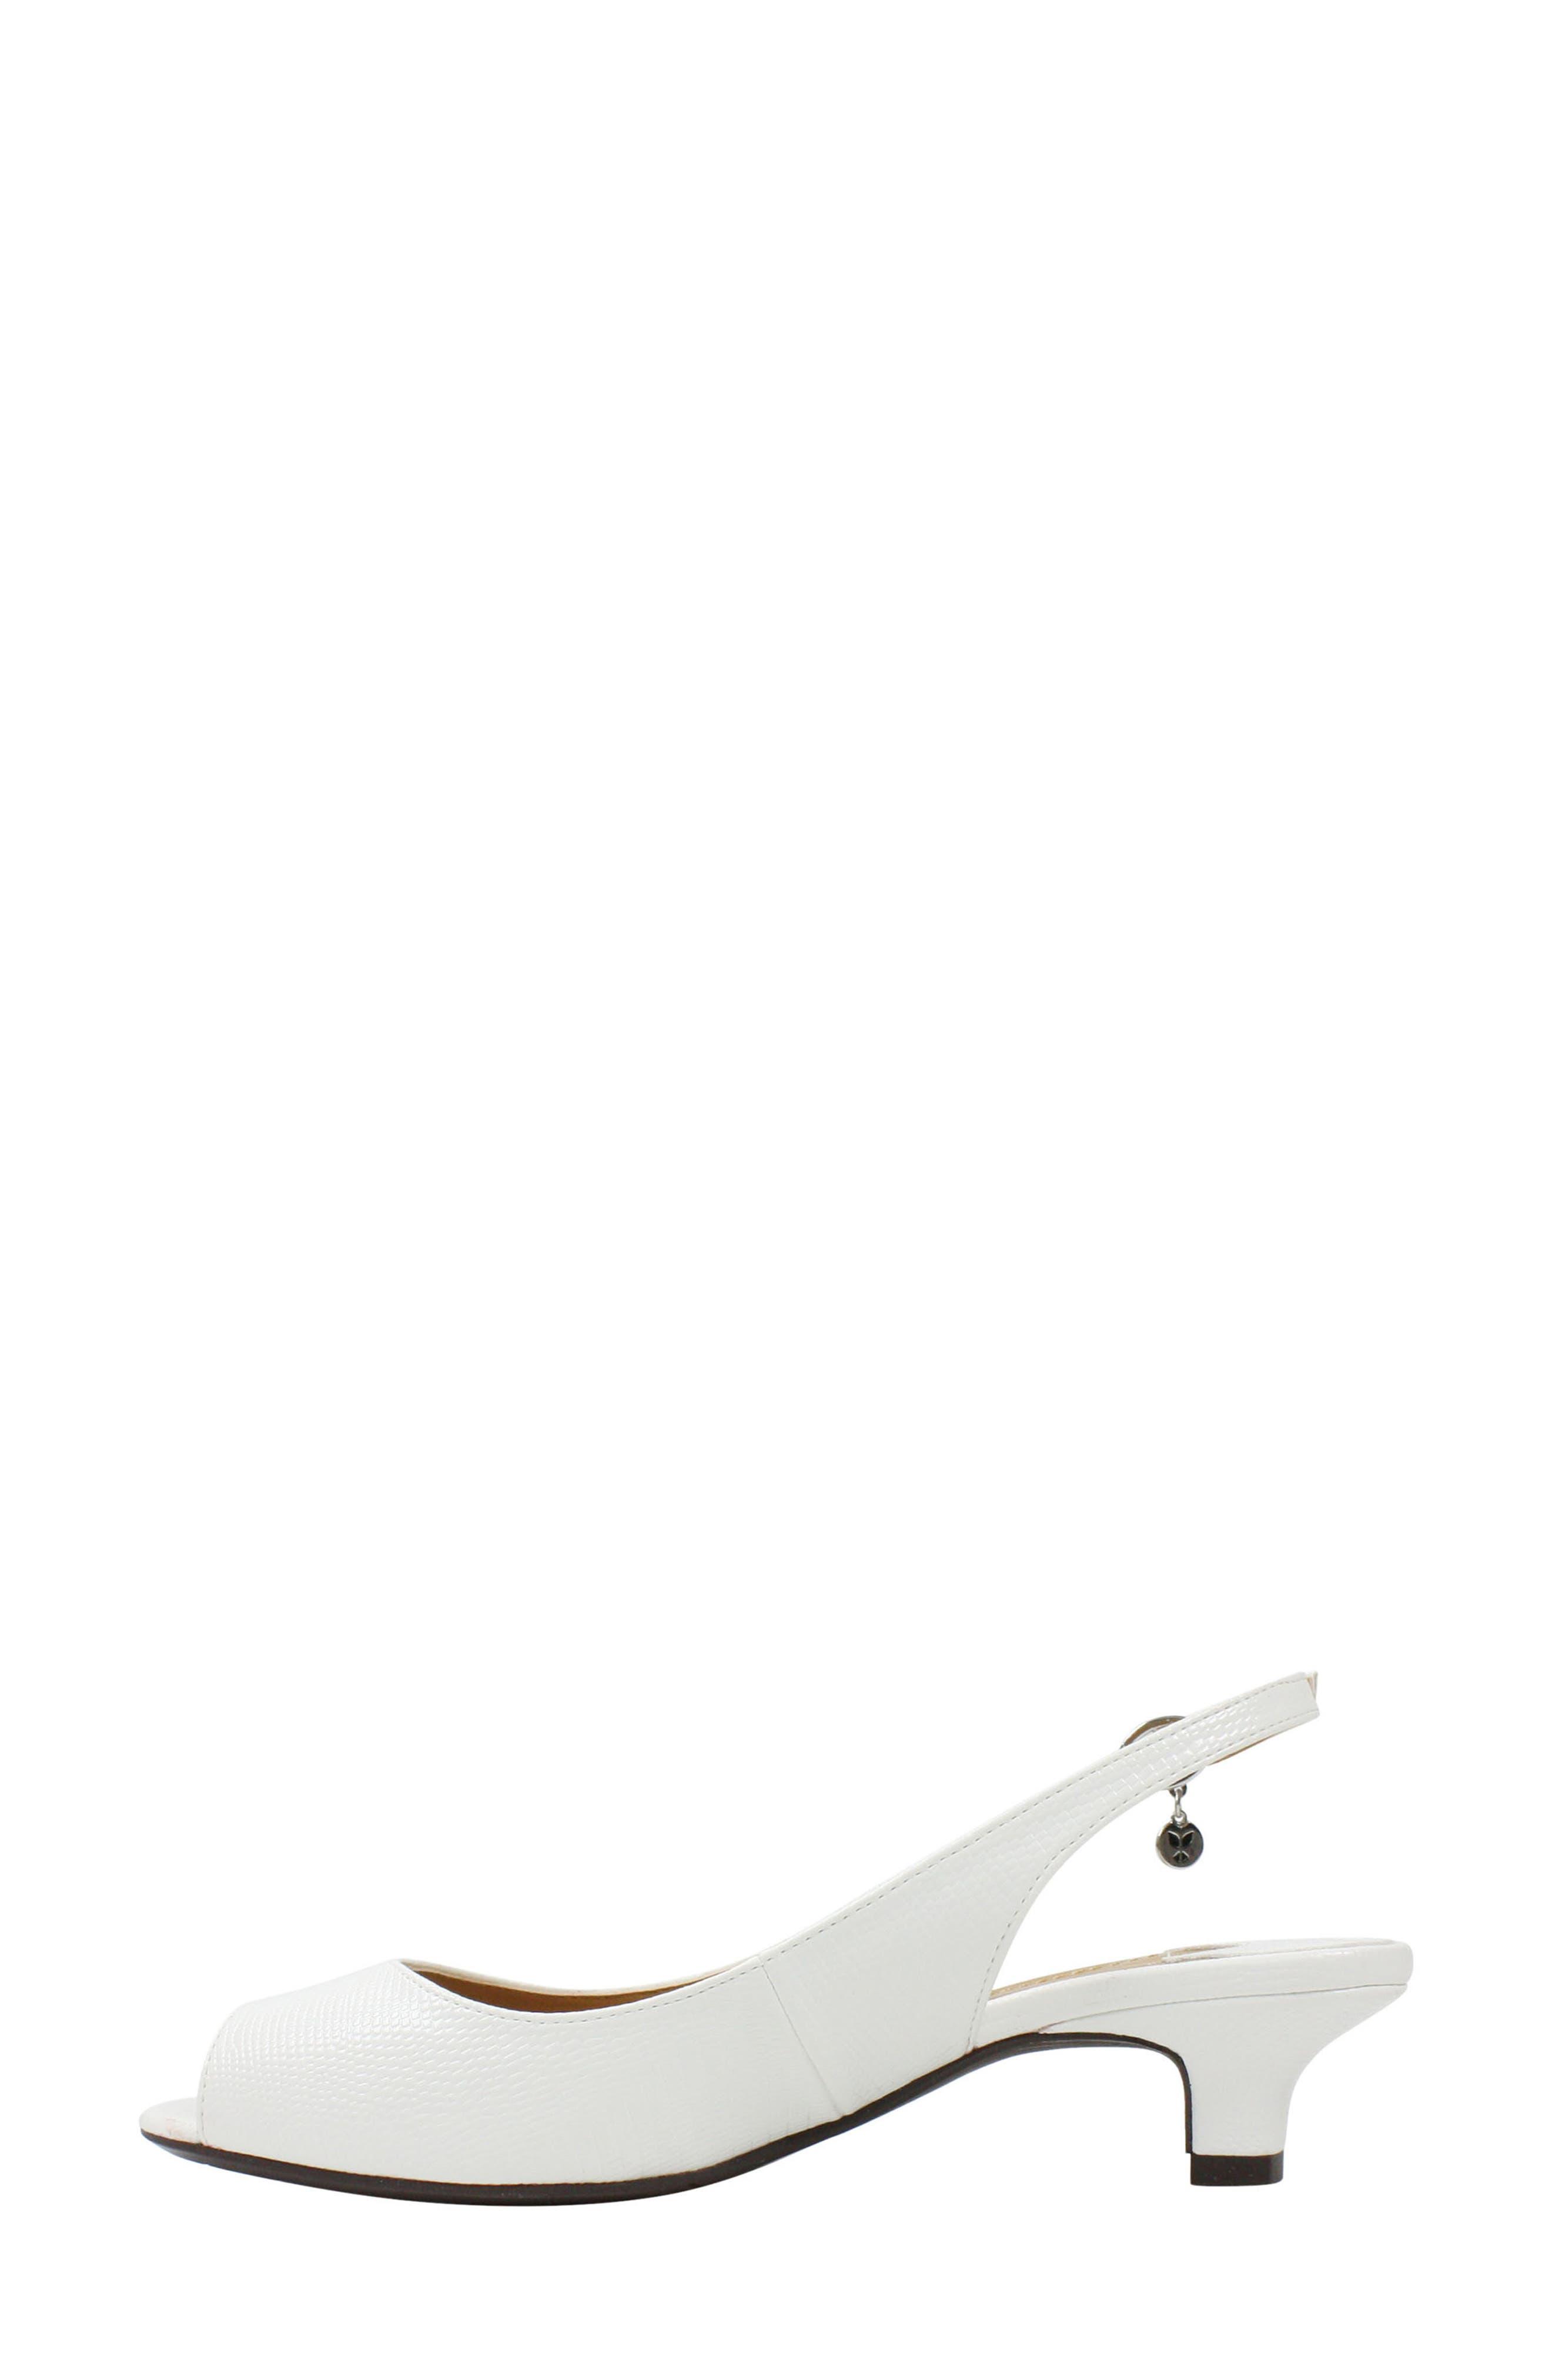 Jenvey Slingback Sandal,                             Alternate thumbnail 7, color,                             WHITE LIZARD PRINT